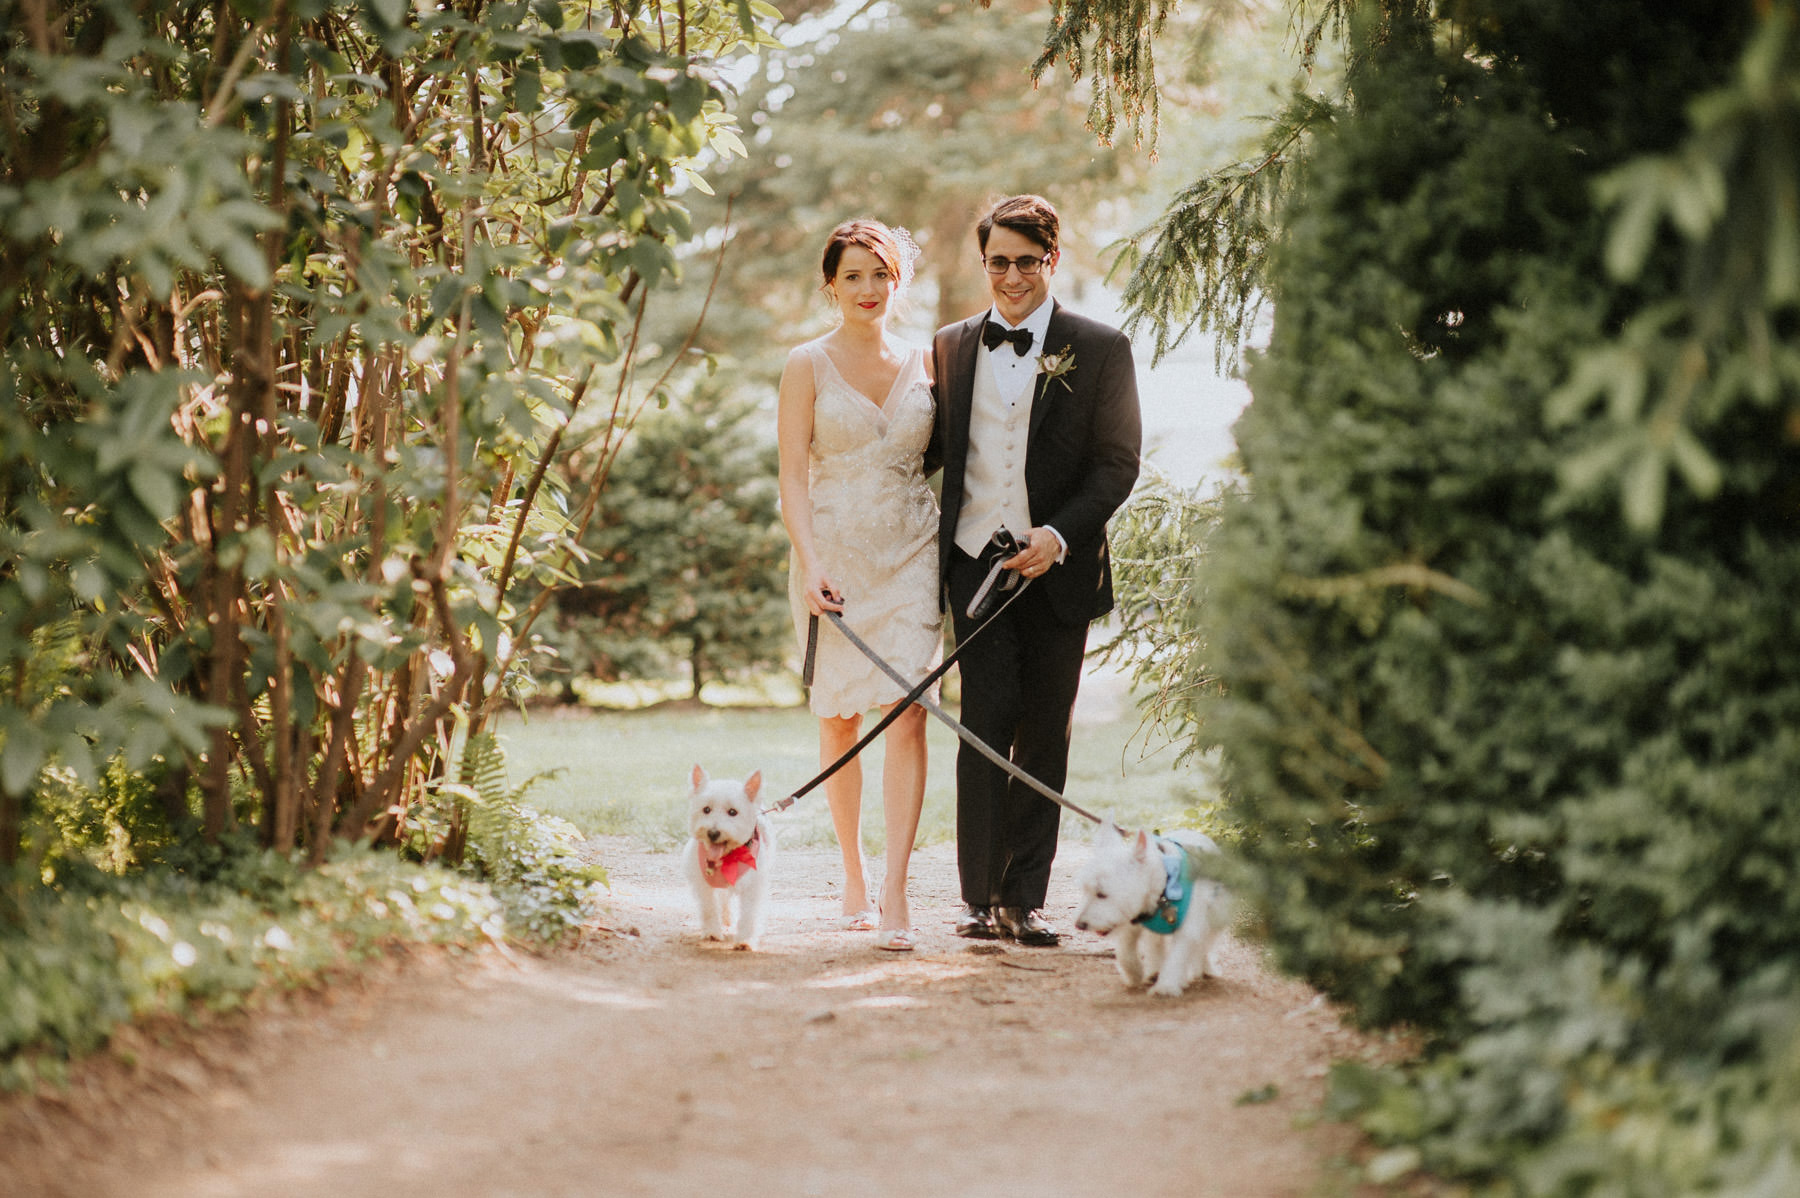 225-inn-at-fernbrook-farms-wedding-14.jpg